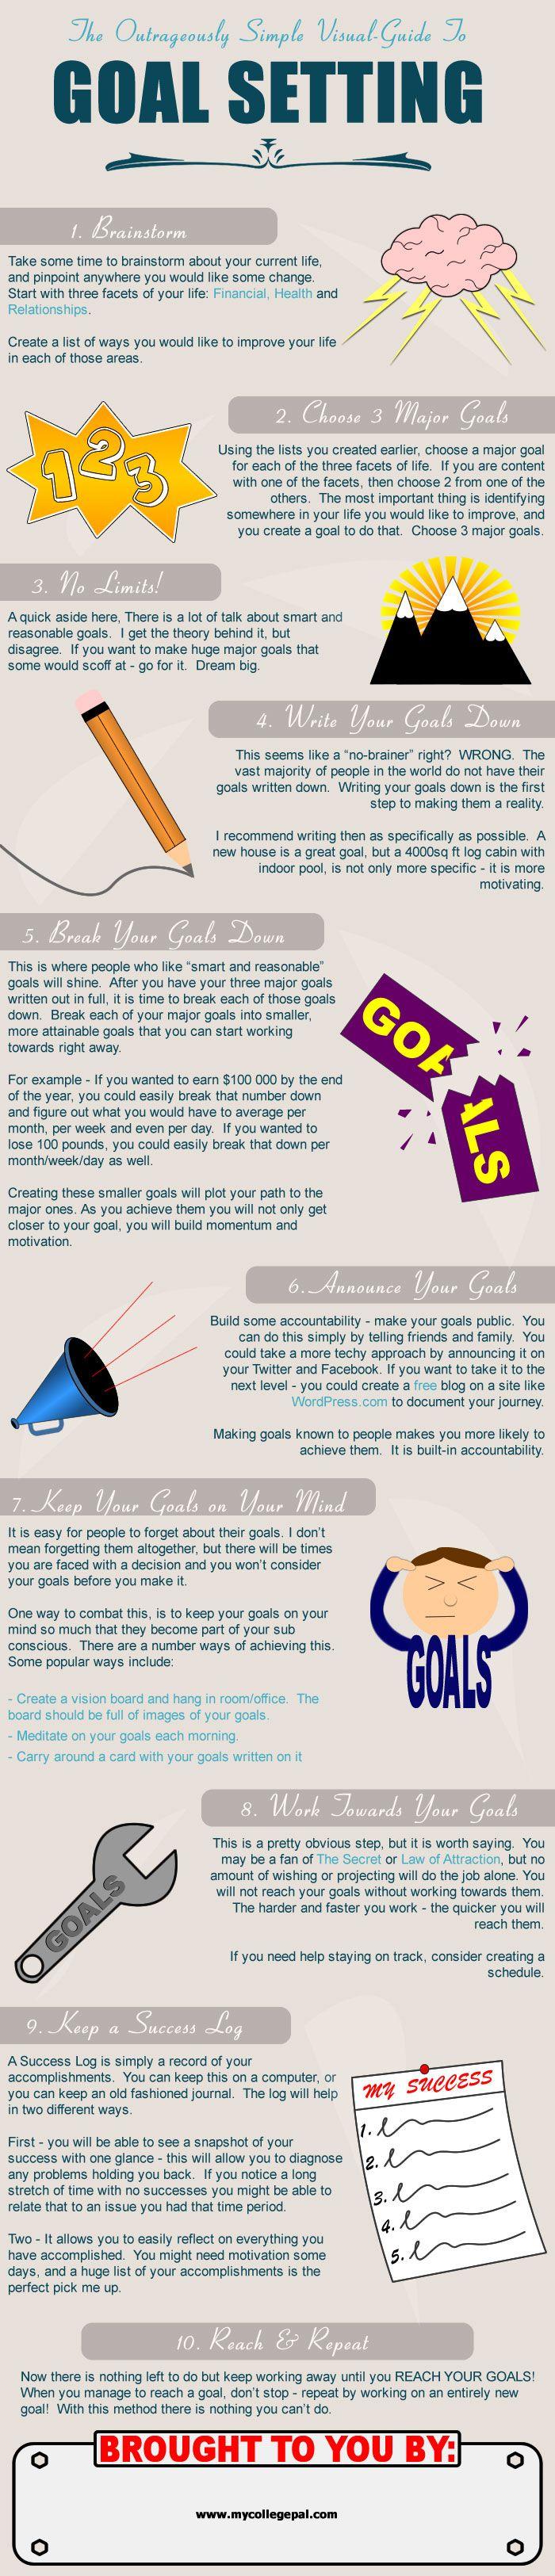 Coaching - Goal Setting Infographic